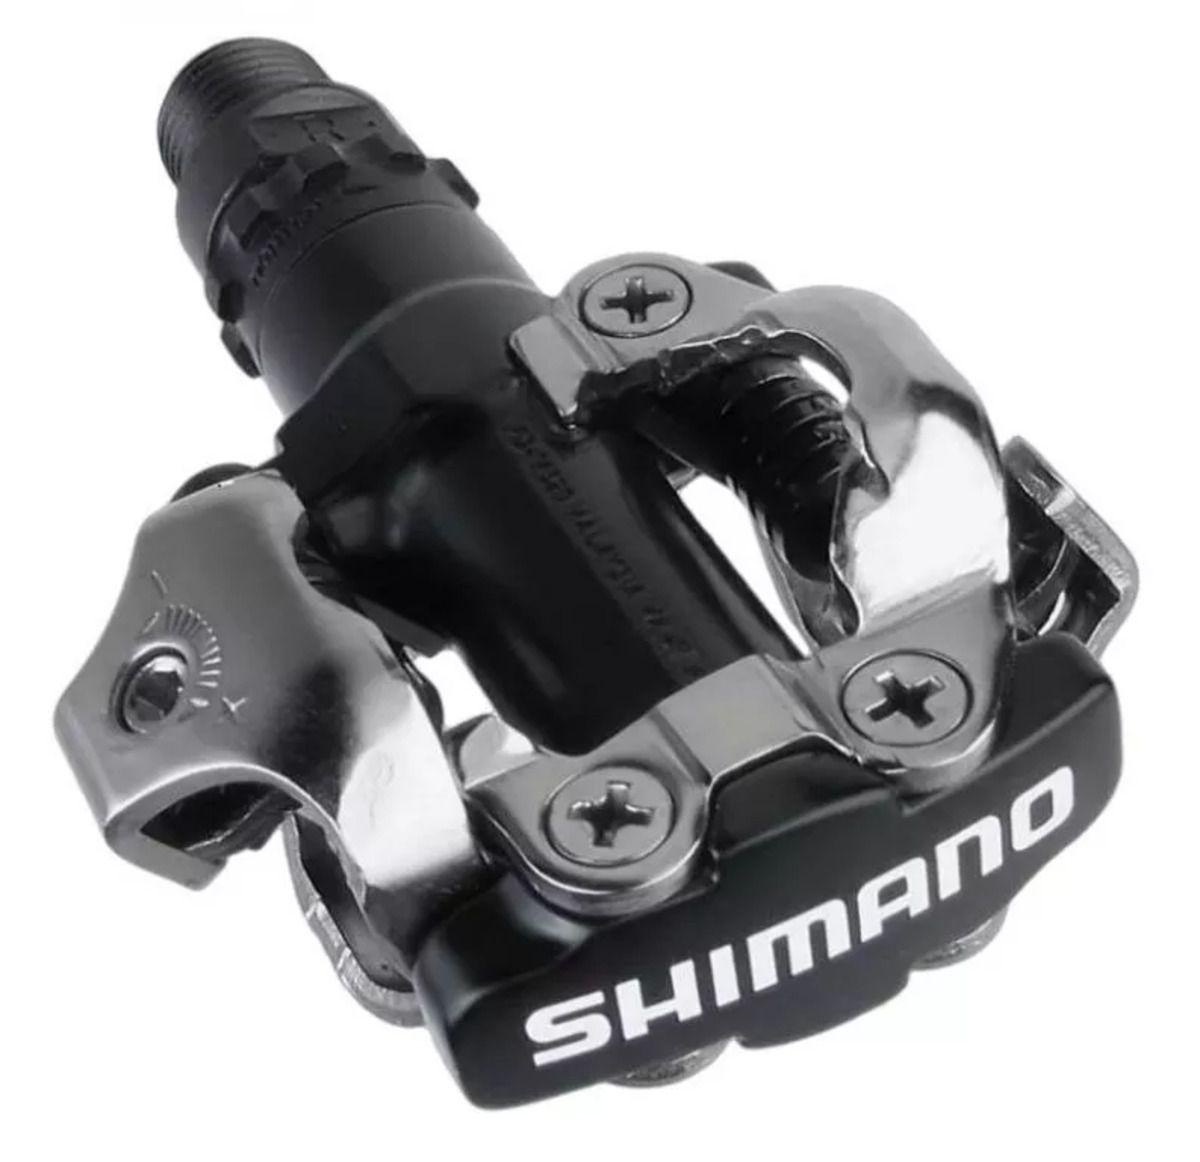 Kit Sapatilha Giro Petra + Pedal Clip Shimano Pd-m520